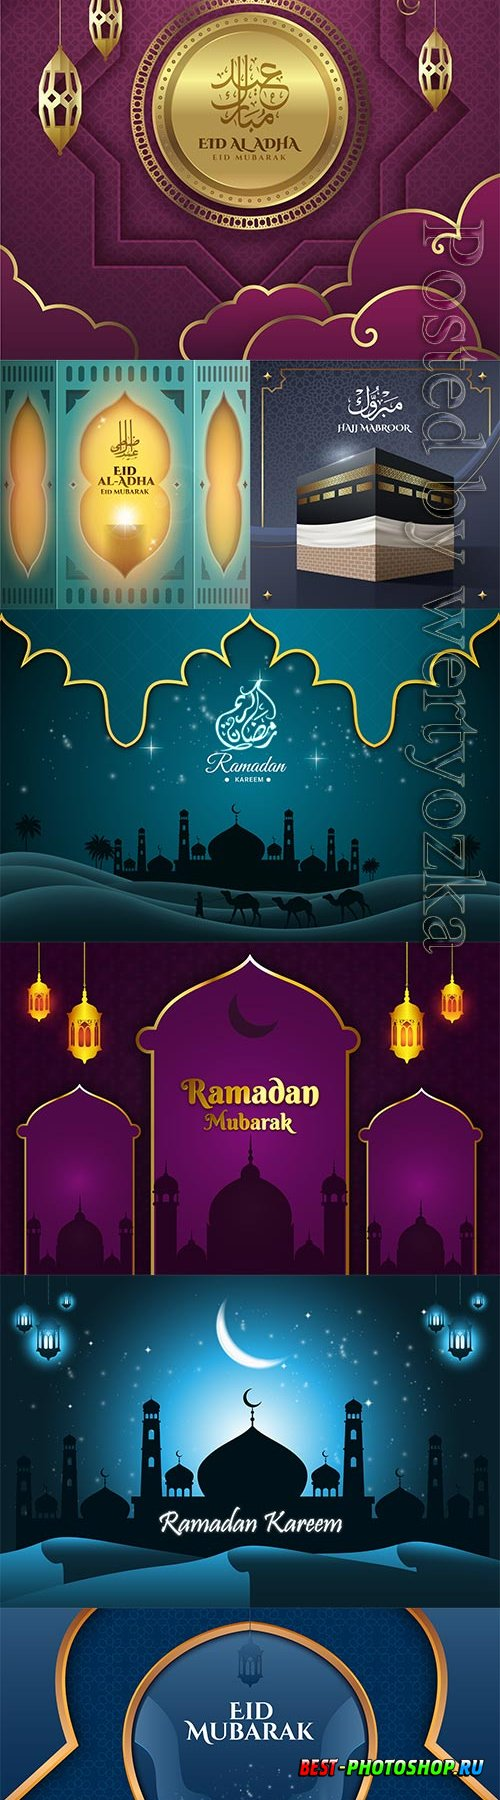 Islamic hajj pilgrimage, Ramadan kareem, eid al adha vector illustration